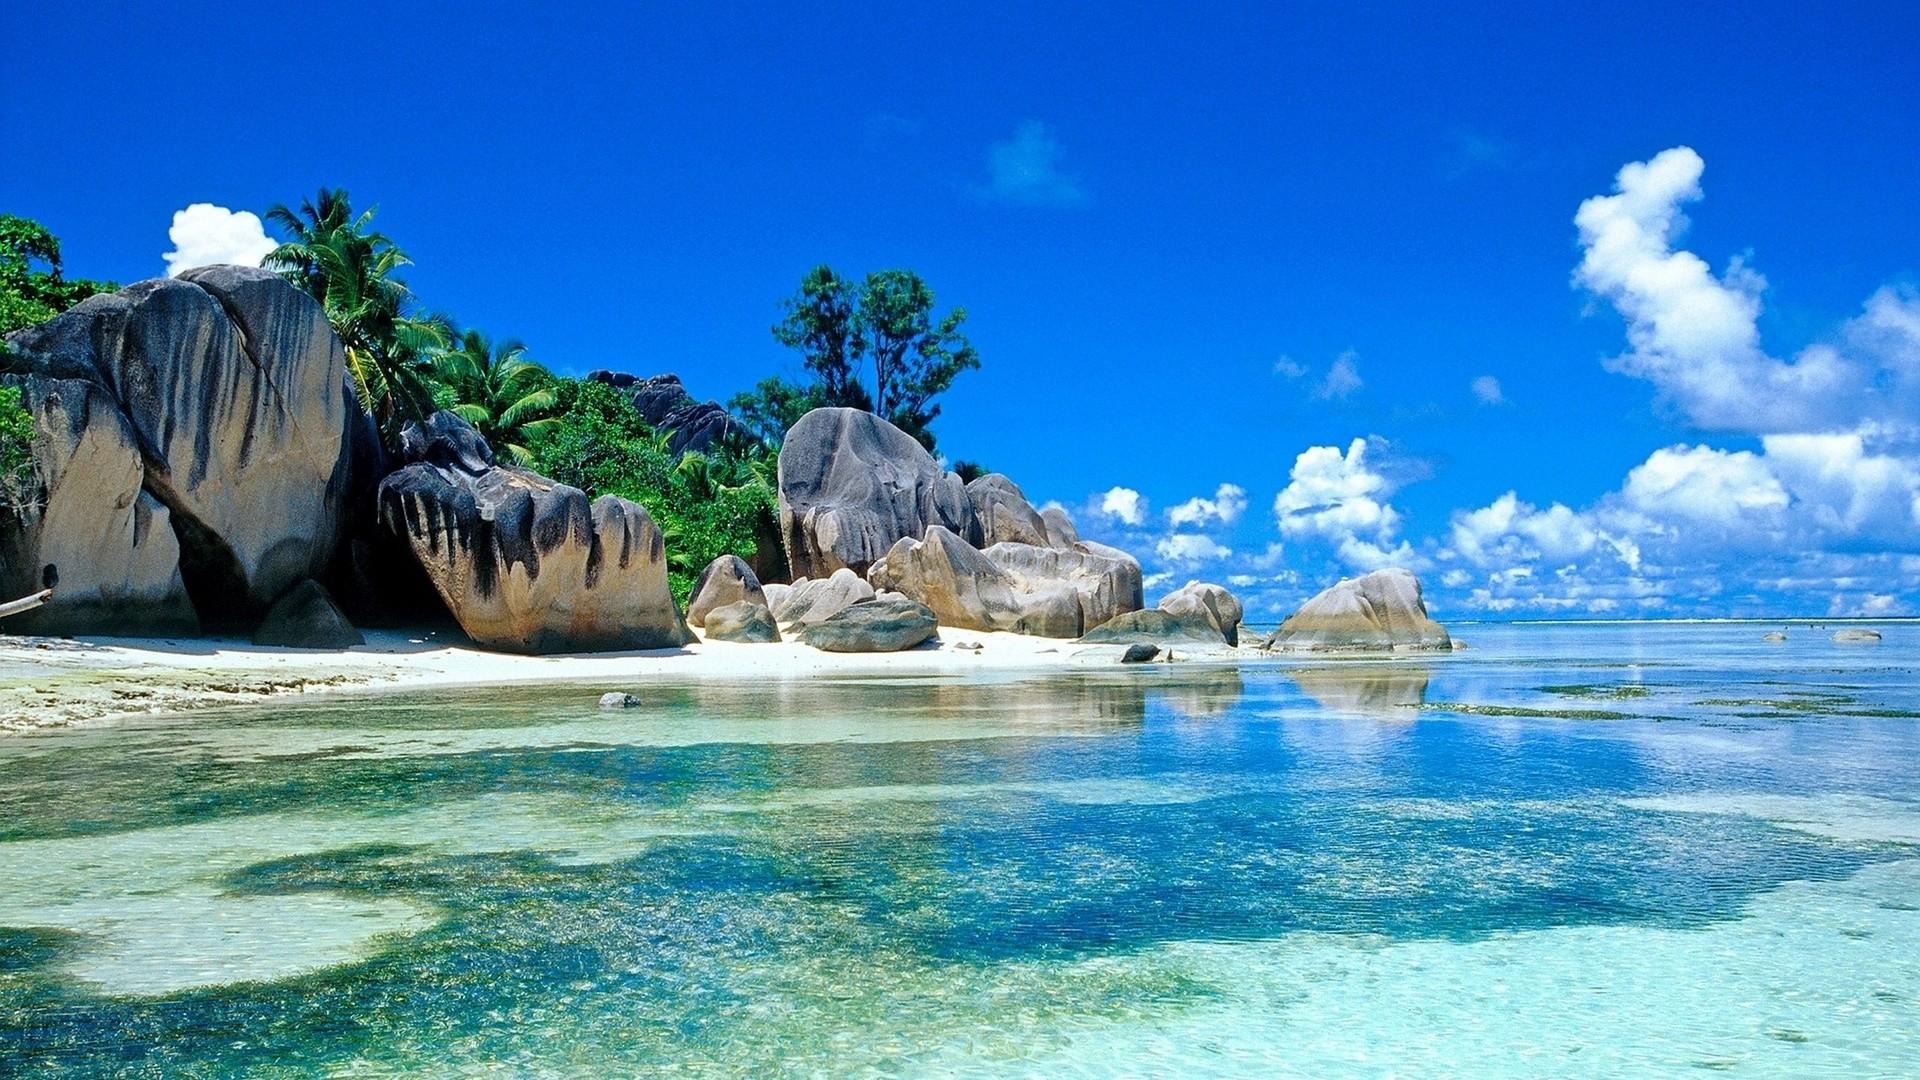 Beautiful tropical beach hd wallpaper 1920×1080 | ImgStocks.com